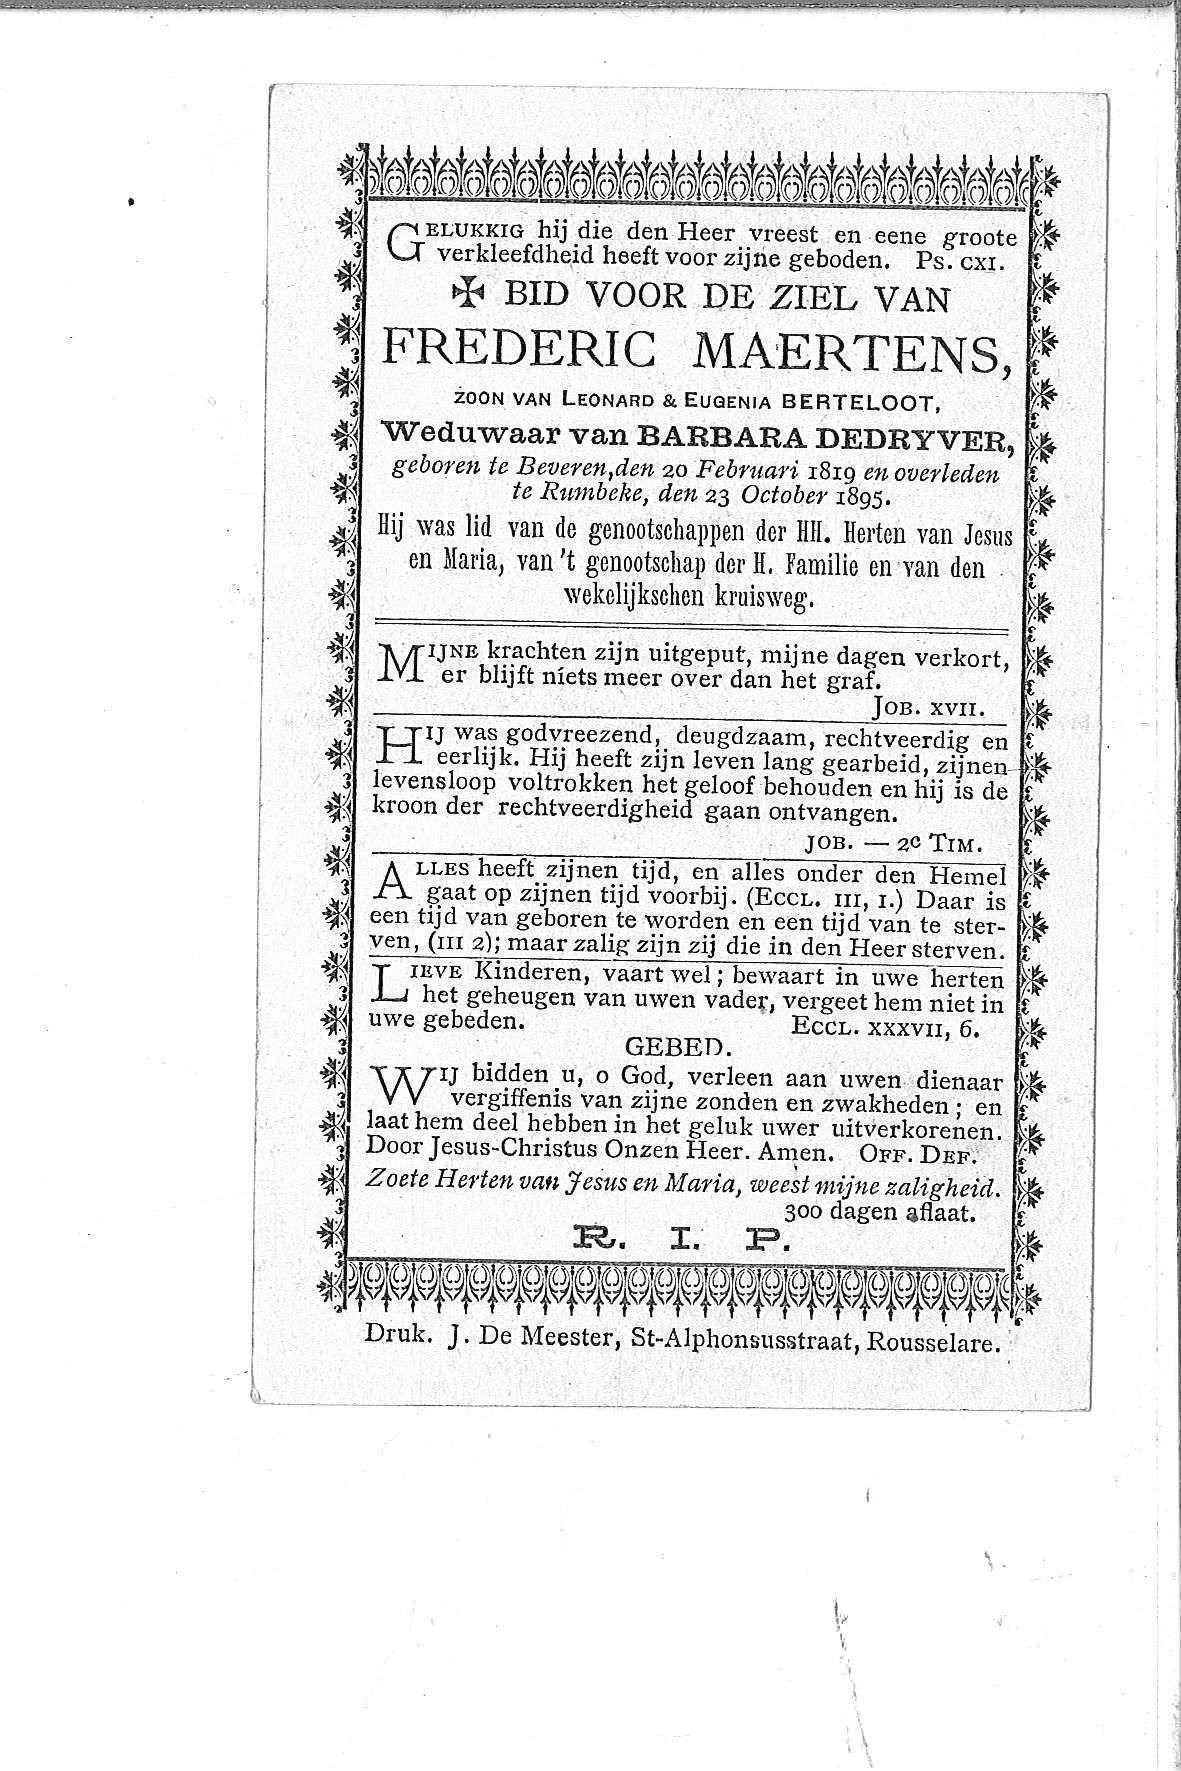 Frederic(1895)20131203082456_00043.jpg